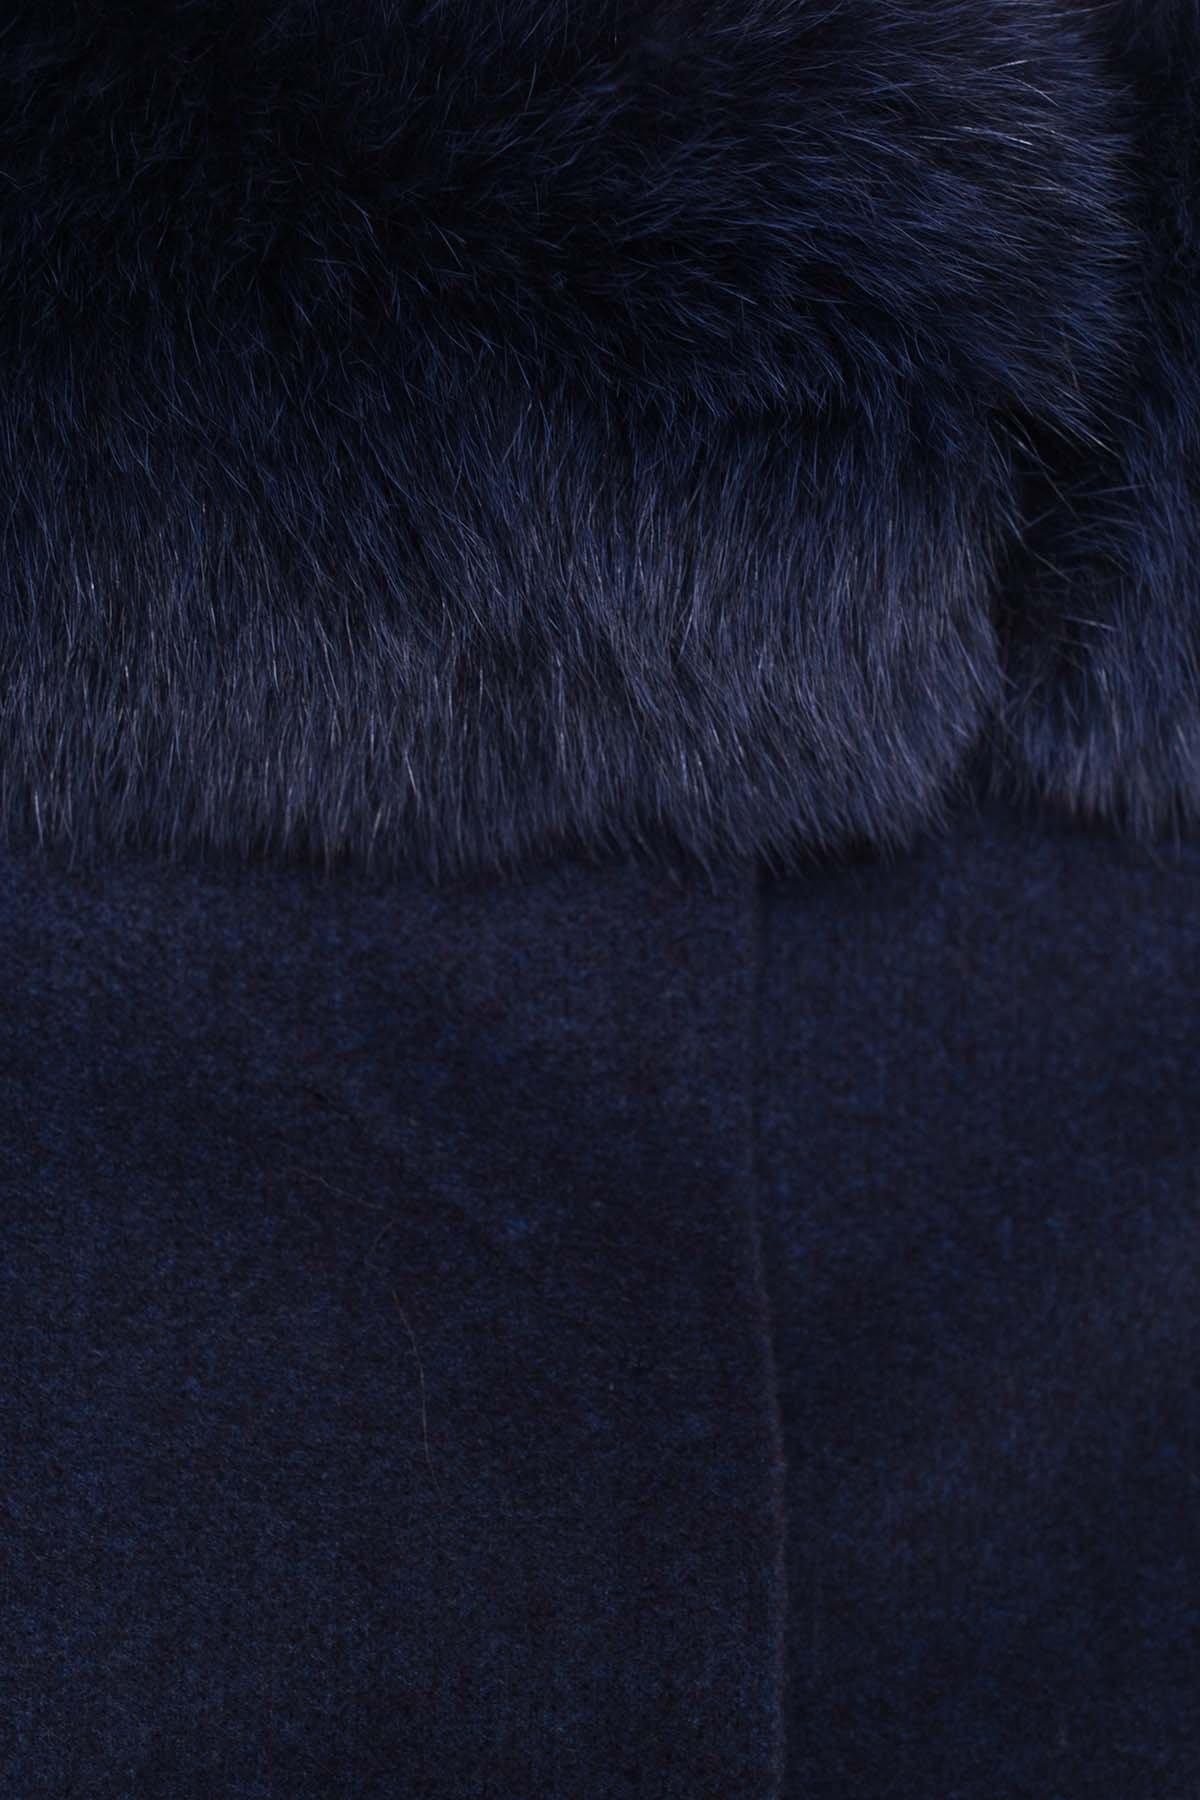 Пальто зима Люцея 5513 АРТ. 37046 Цвет: Темно-синий 17 - фото 5, интернет магазин tm-modus.ru